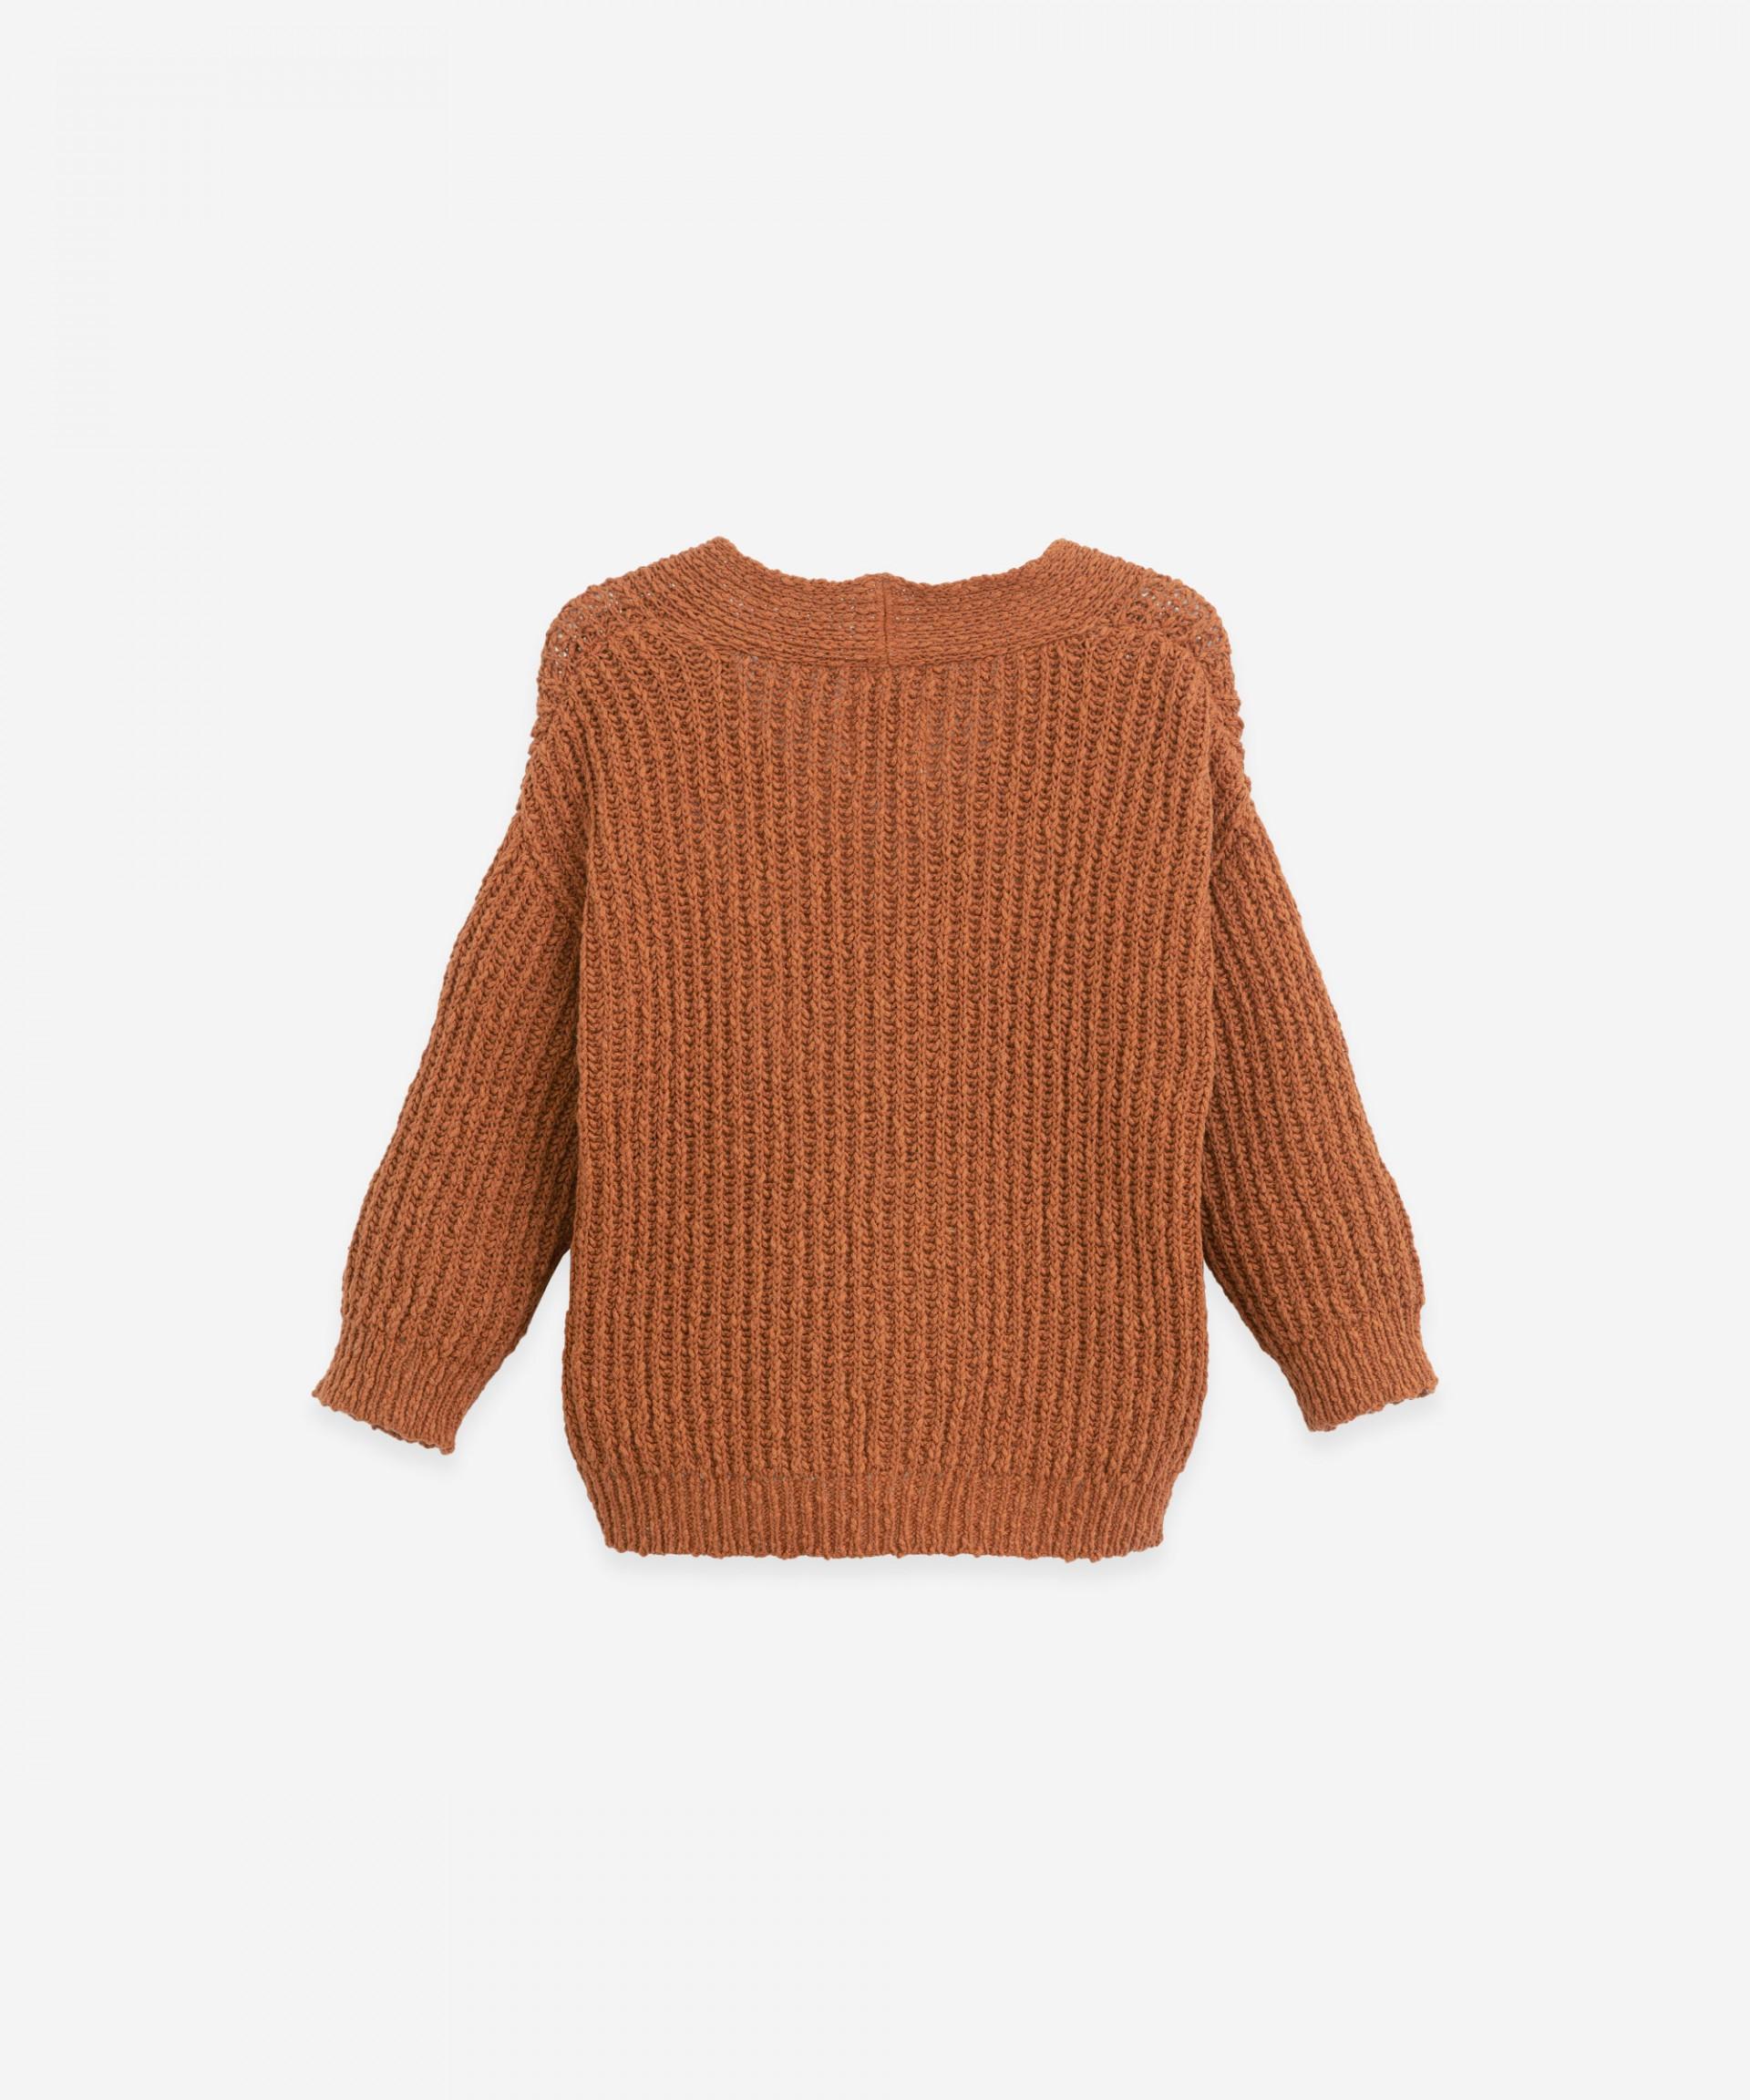 Chaqueta efecto tricot | Botany